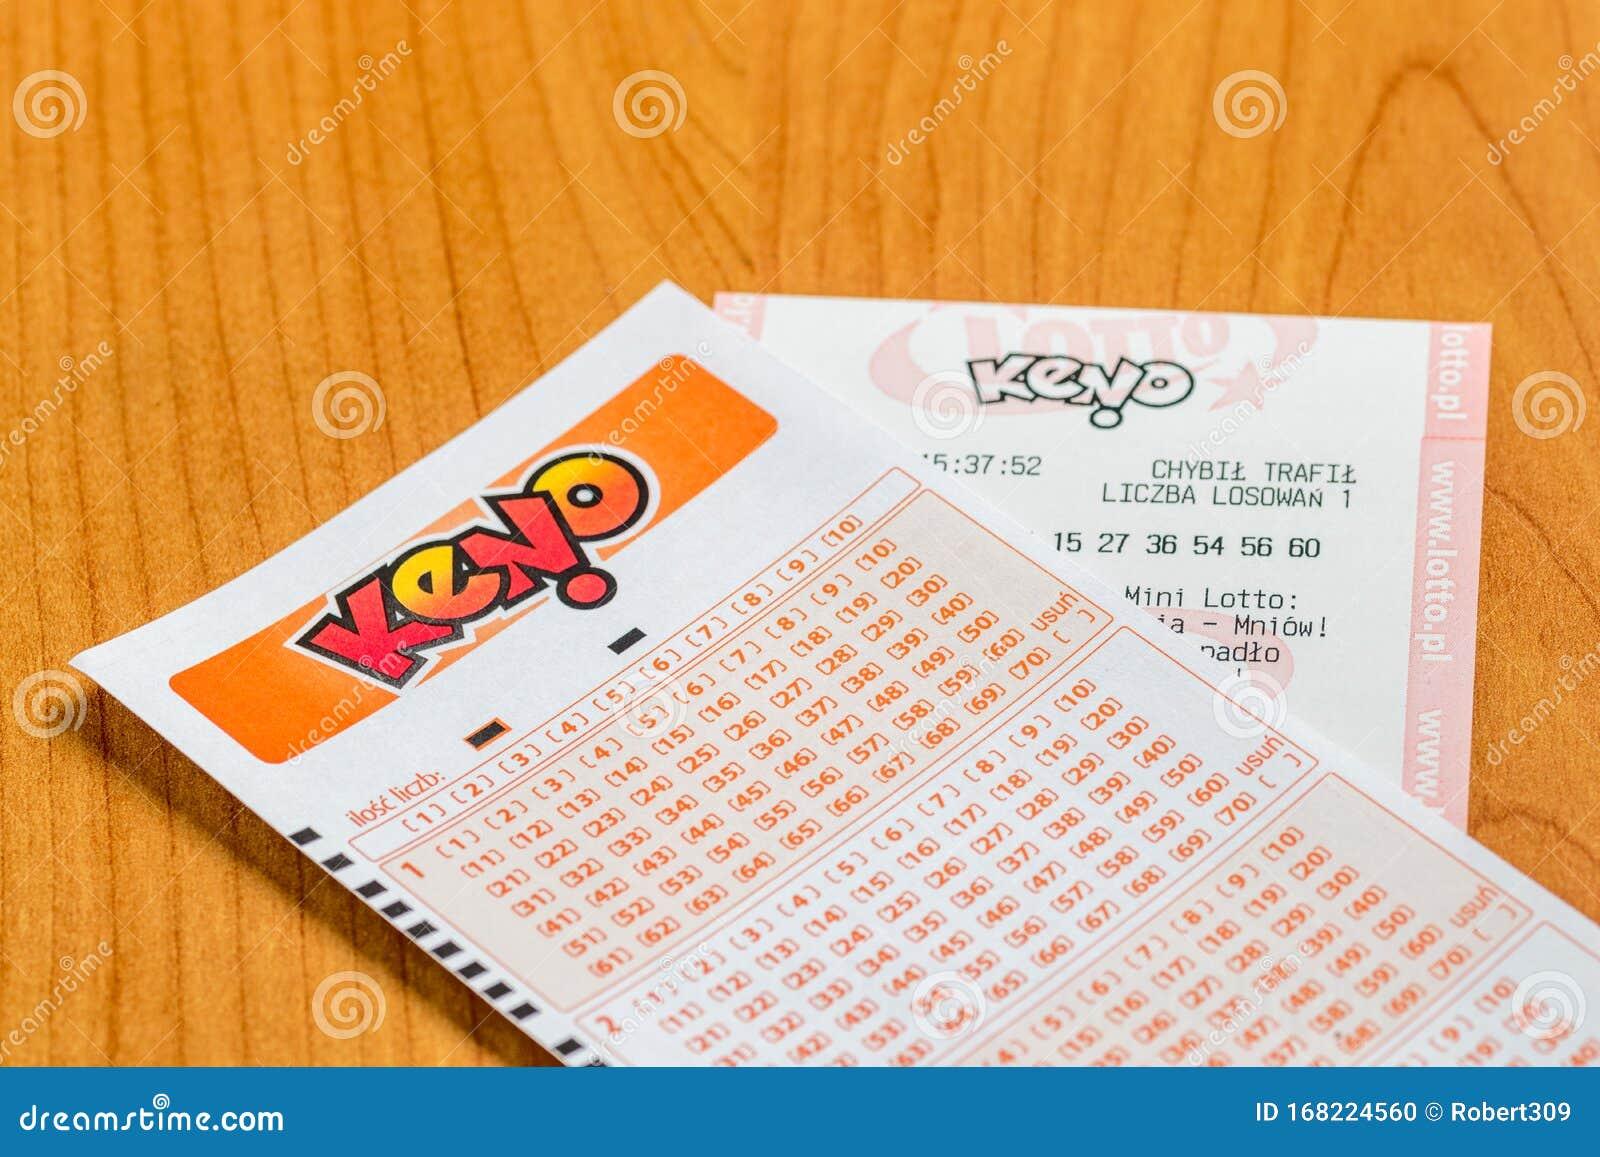 Keno Von Lotto